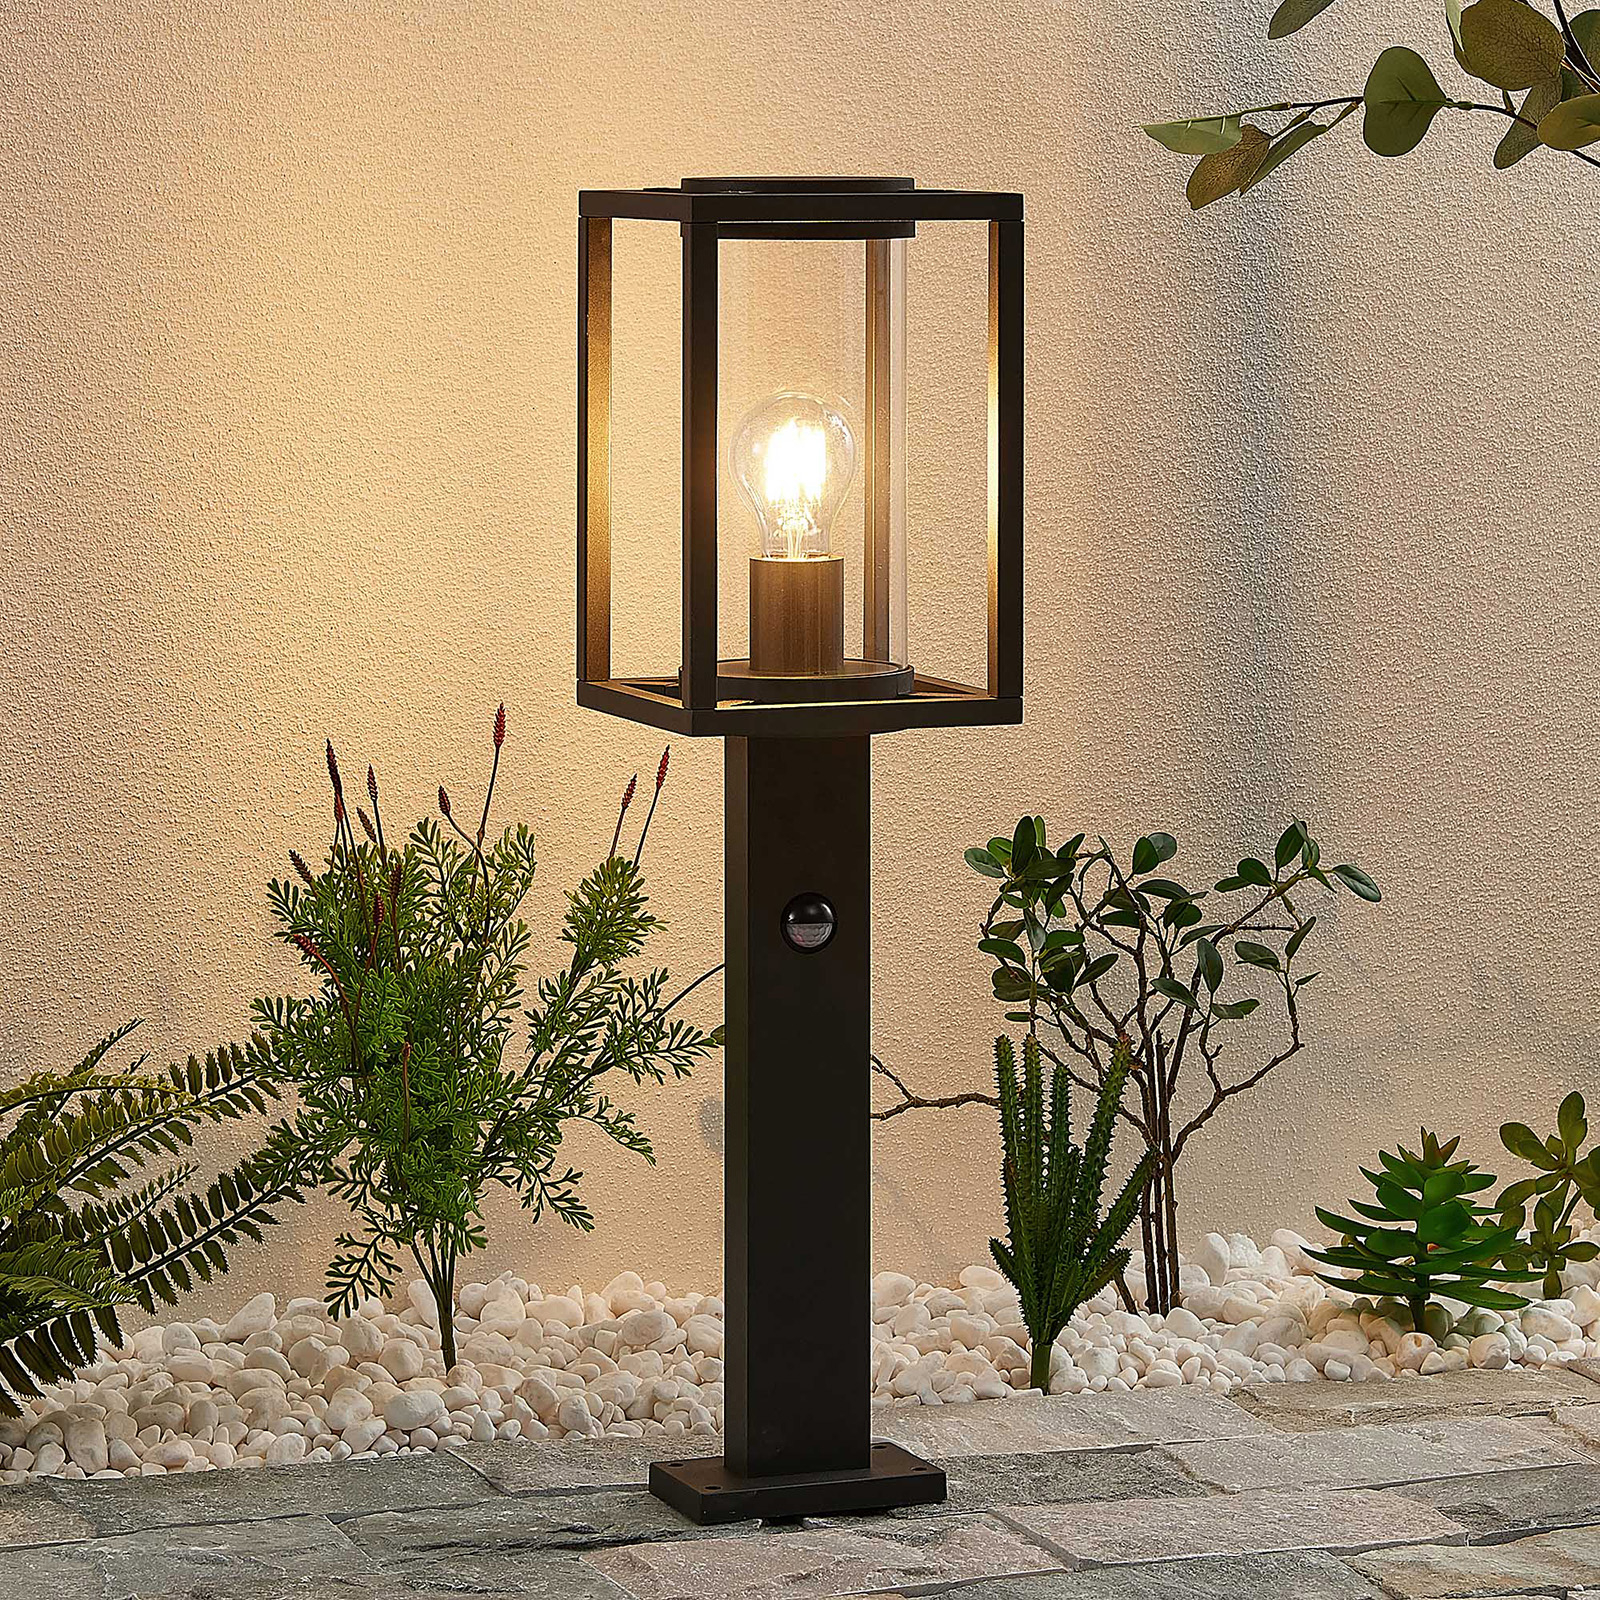 Lucande Ferda veilampe bevegelsessensor, 60 cm